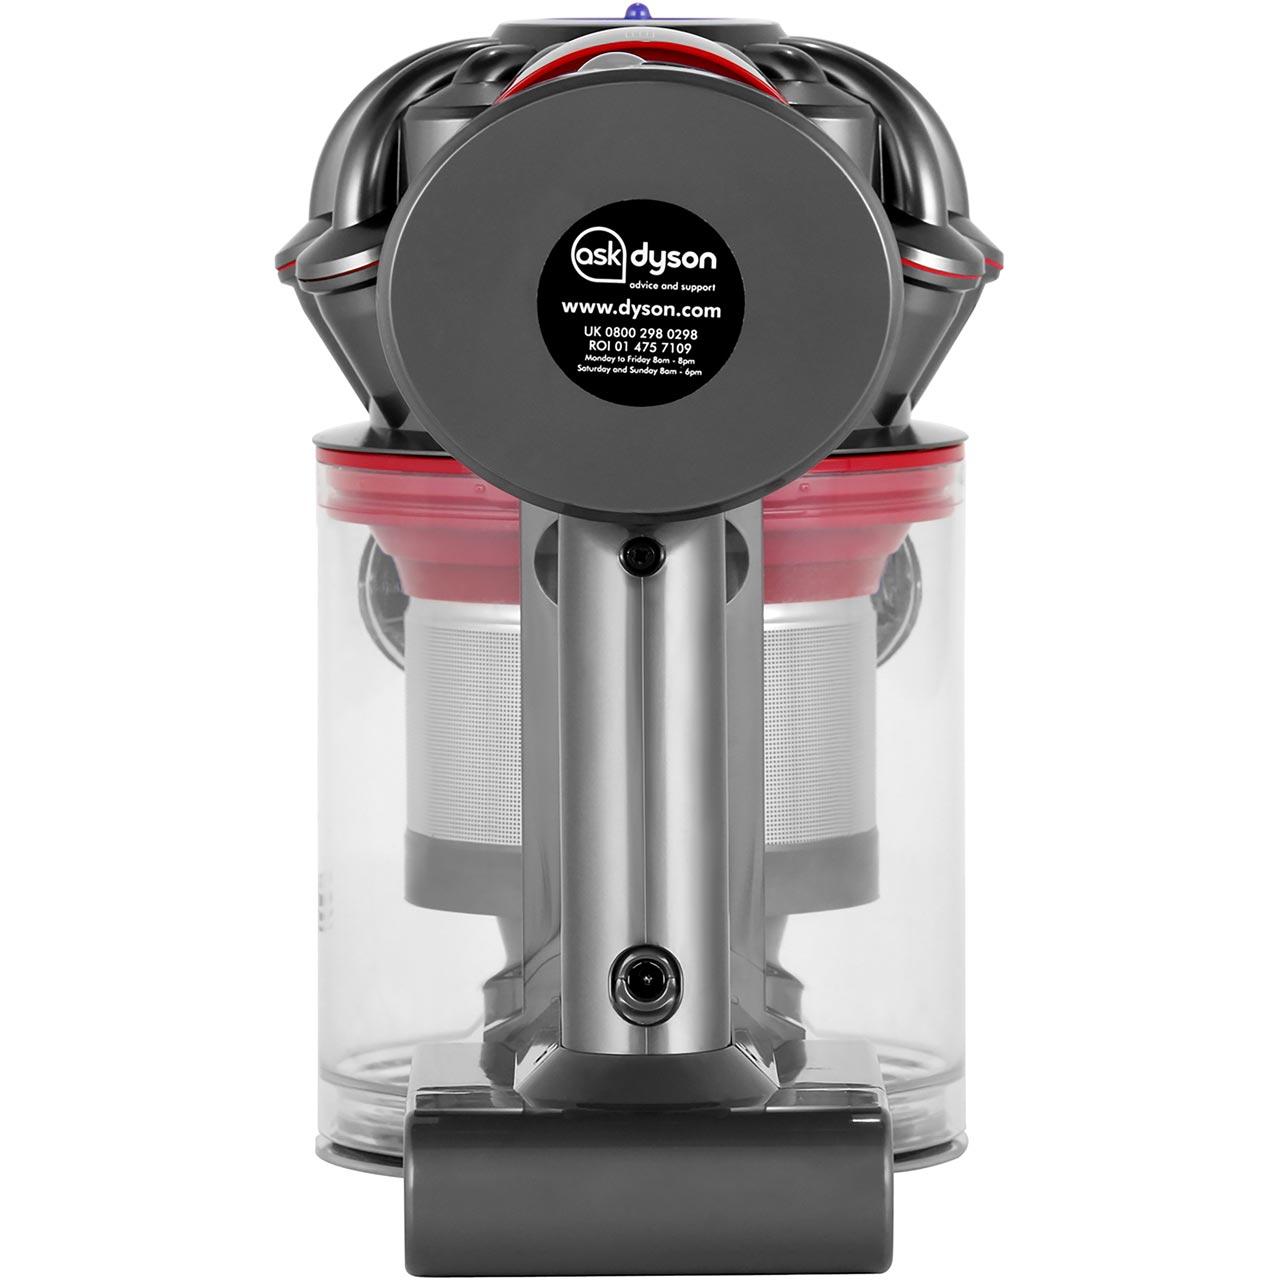 dyson v7 animal cordless vacuum cleaner 2 year. Black Bedroom Furniture Sets. Home Design Ideas